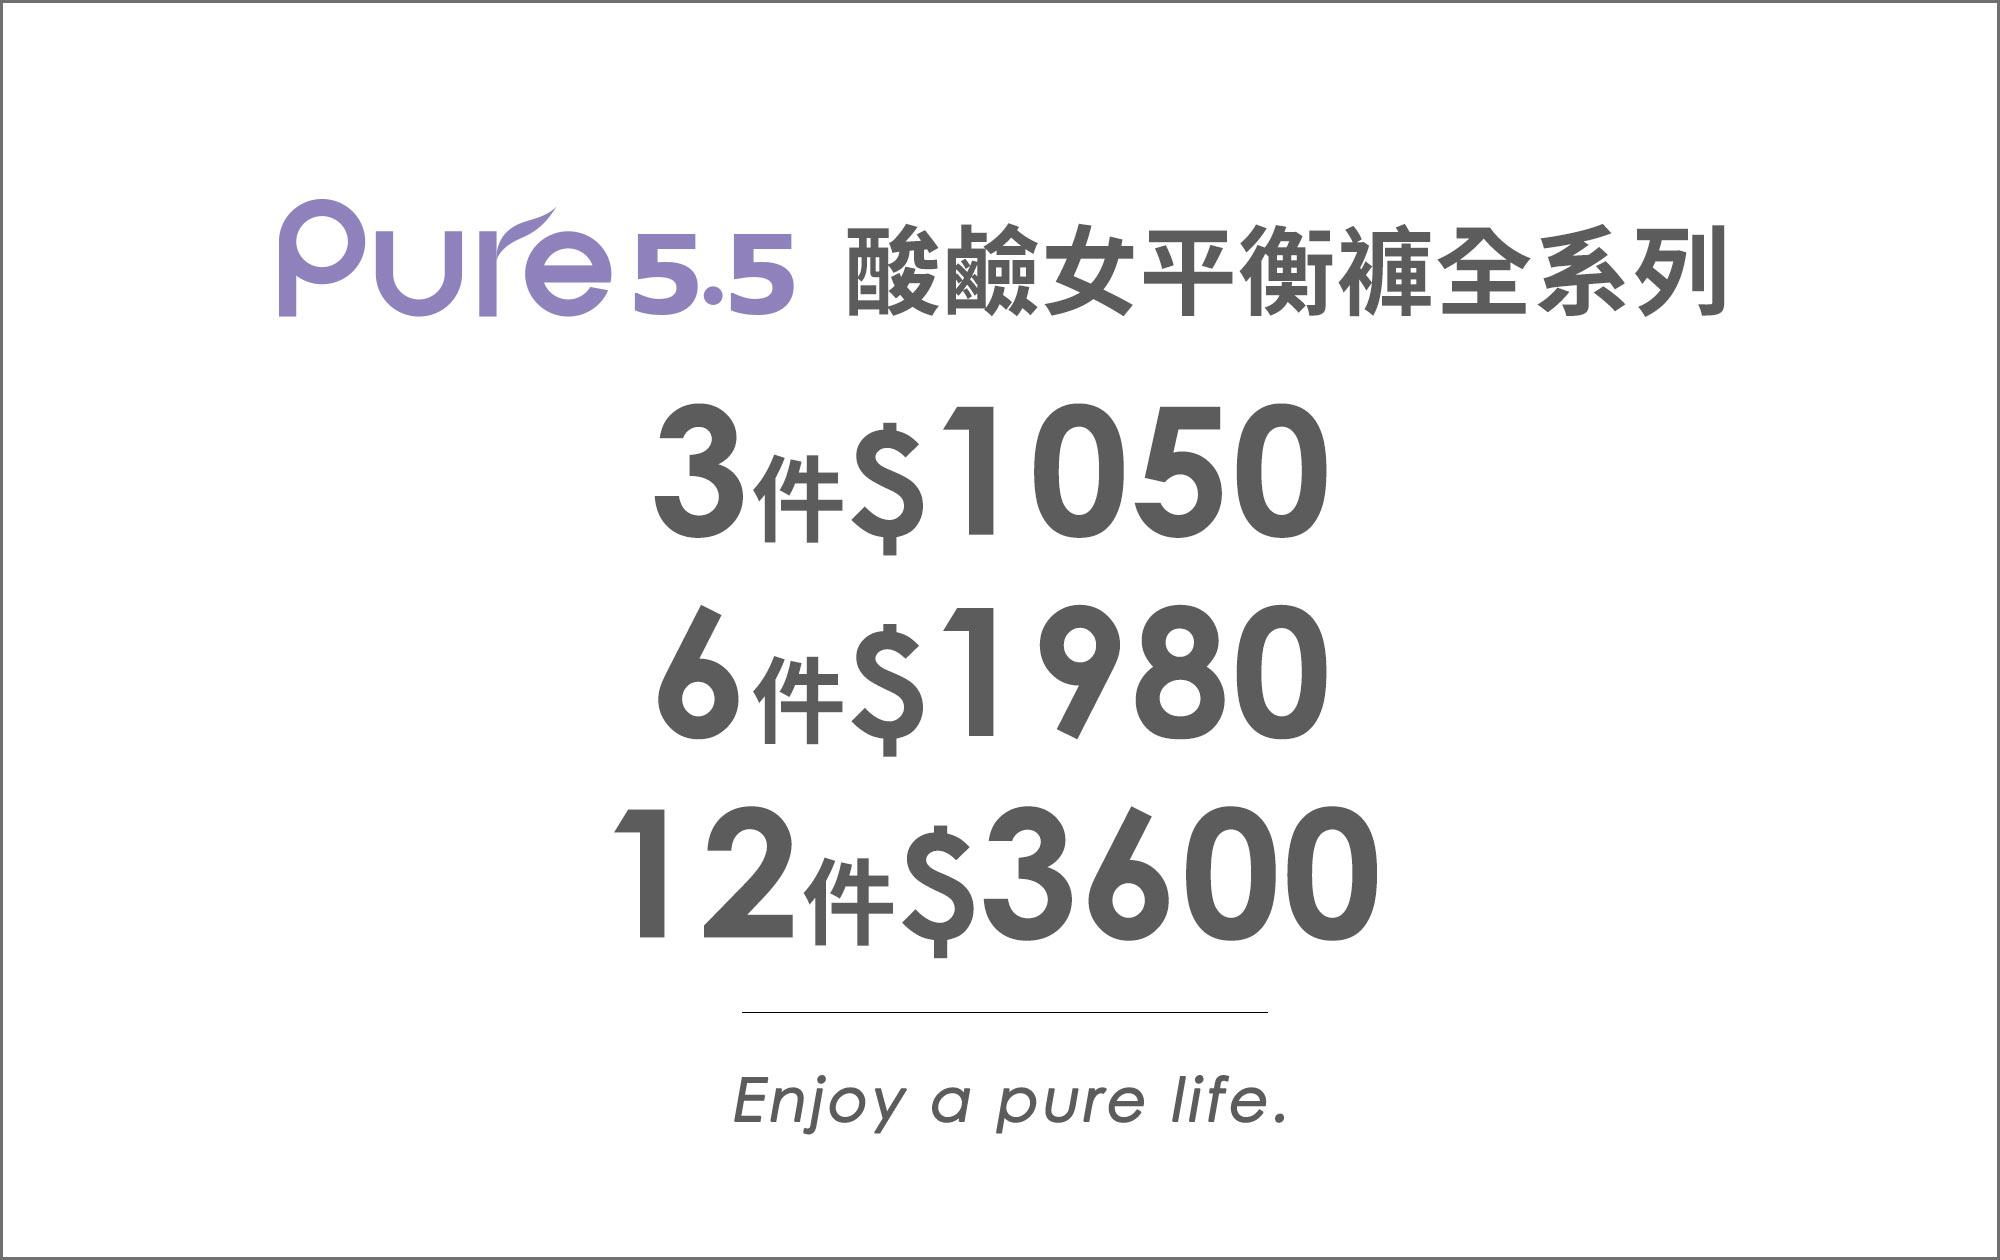 Pure5.5酸鹼女平衡褲全系列 3件$1050 6件$1980 12件$3600